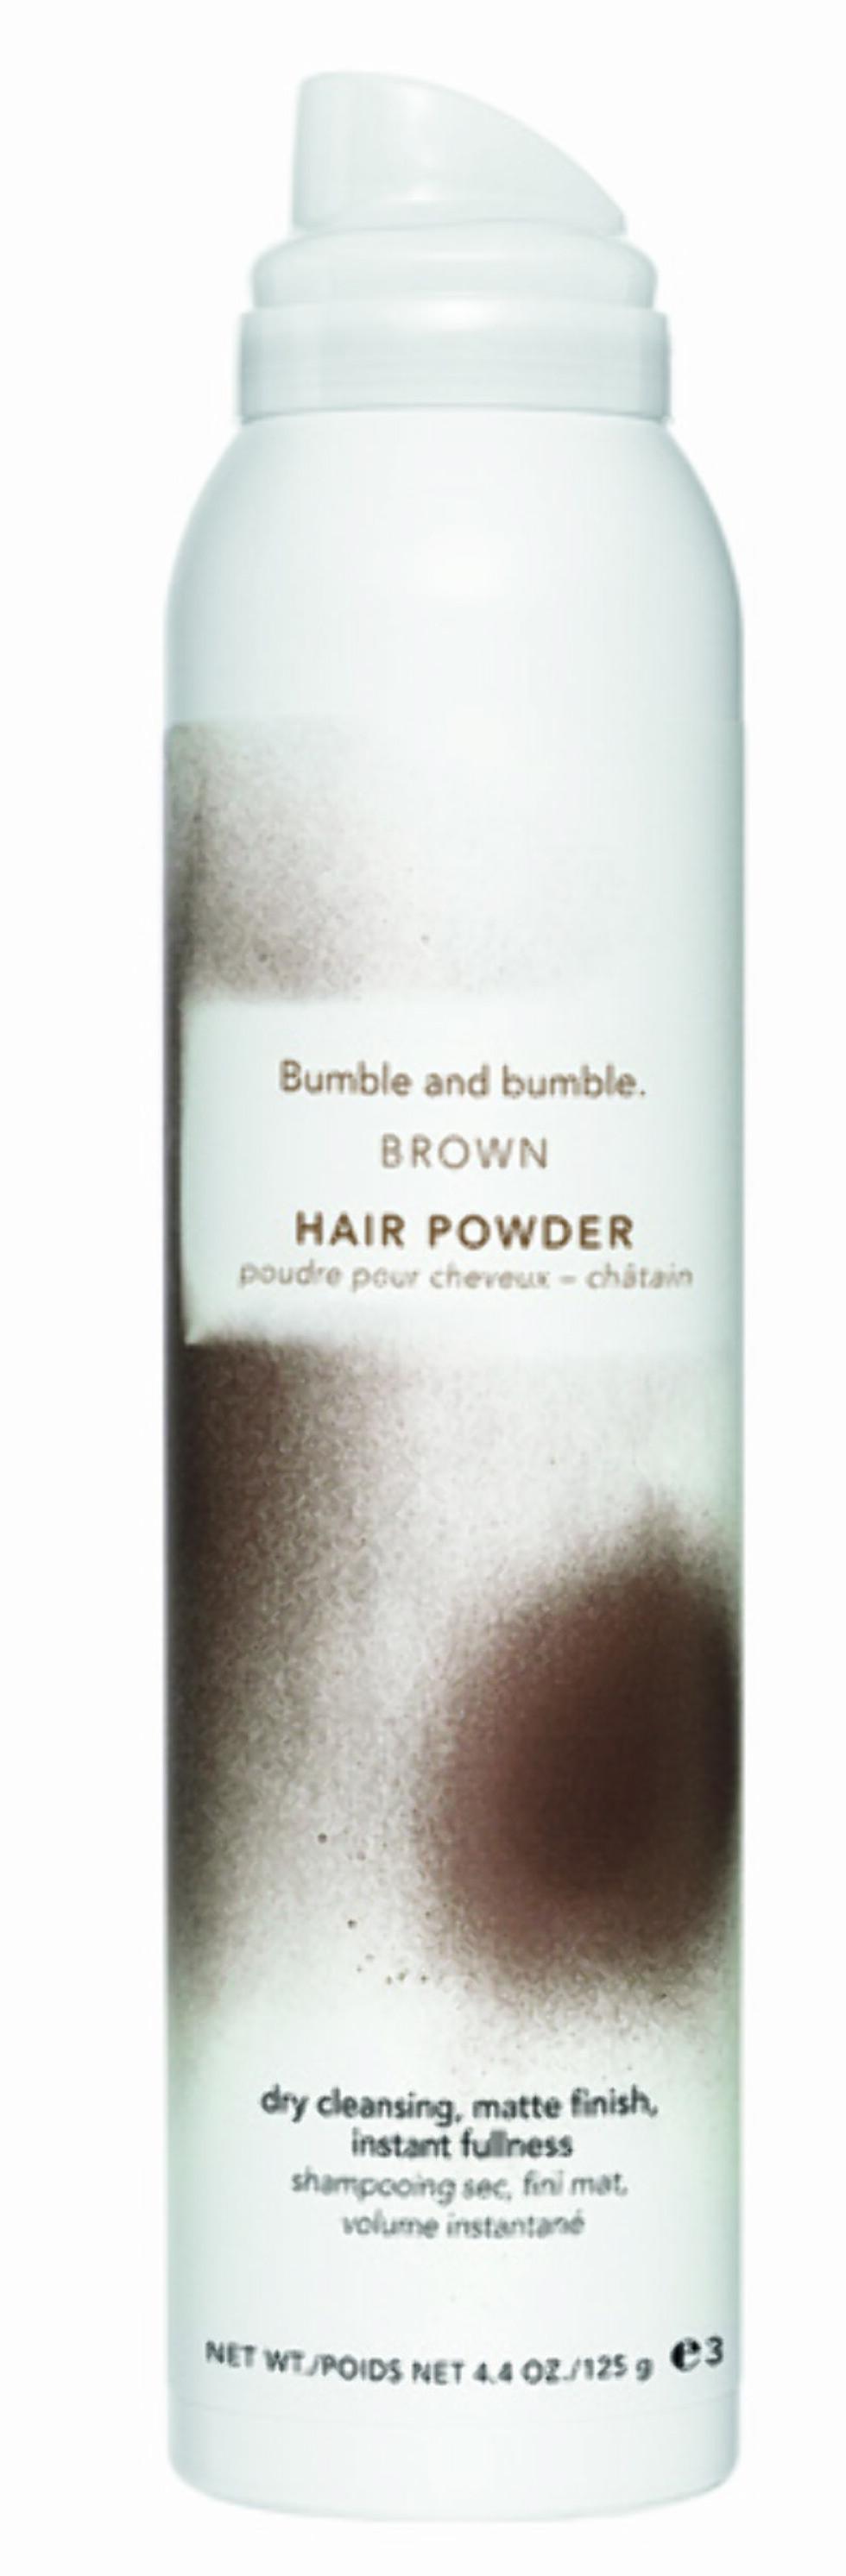 Hårpudder for brunetter fra Bumble and bumble. Kommer i to størrelser: 28 g, kr 235 og 125 g, kr 423.